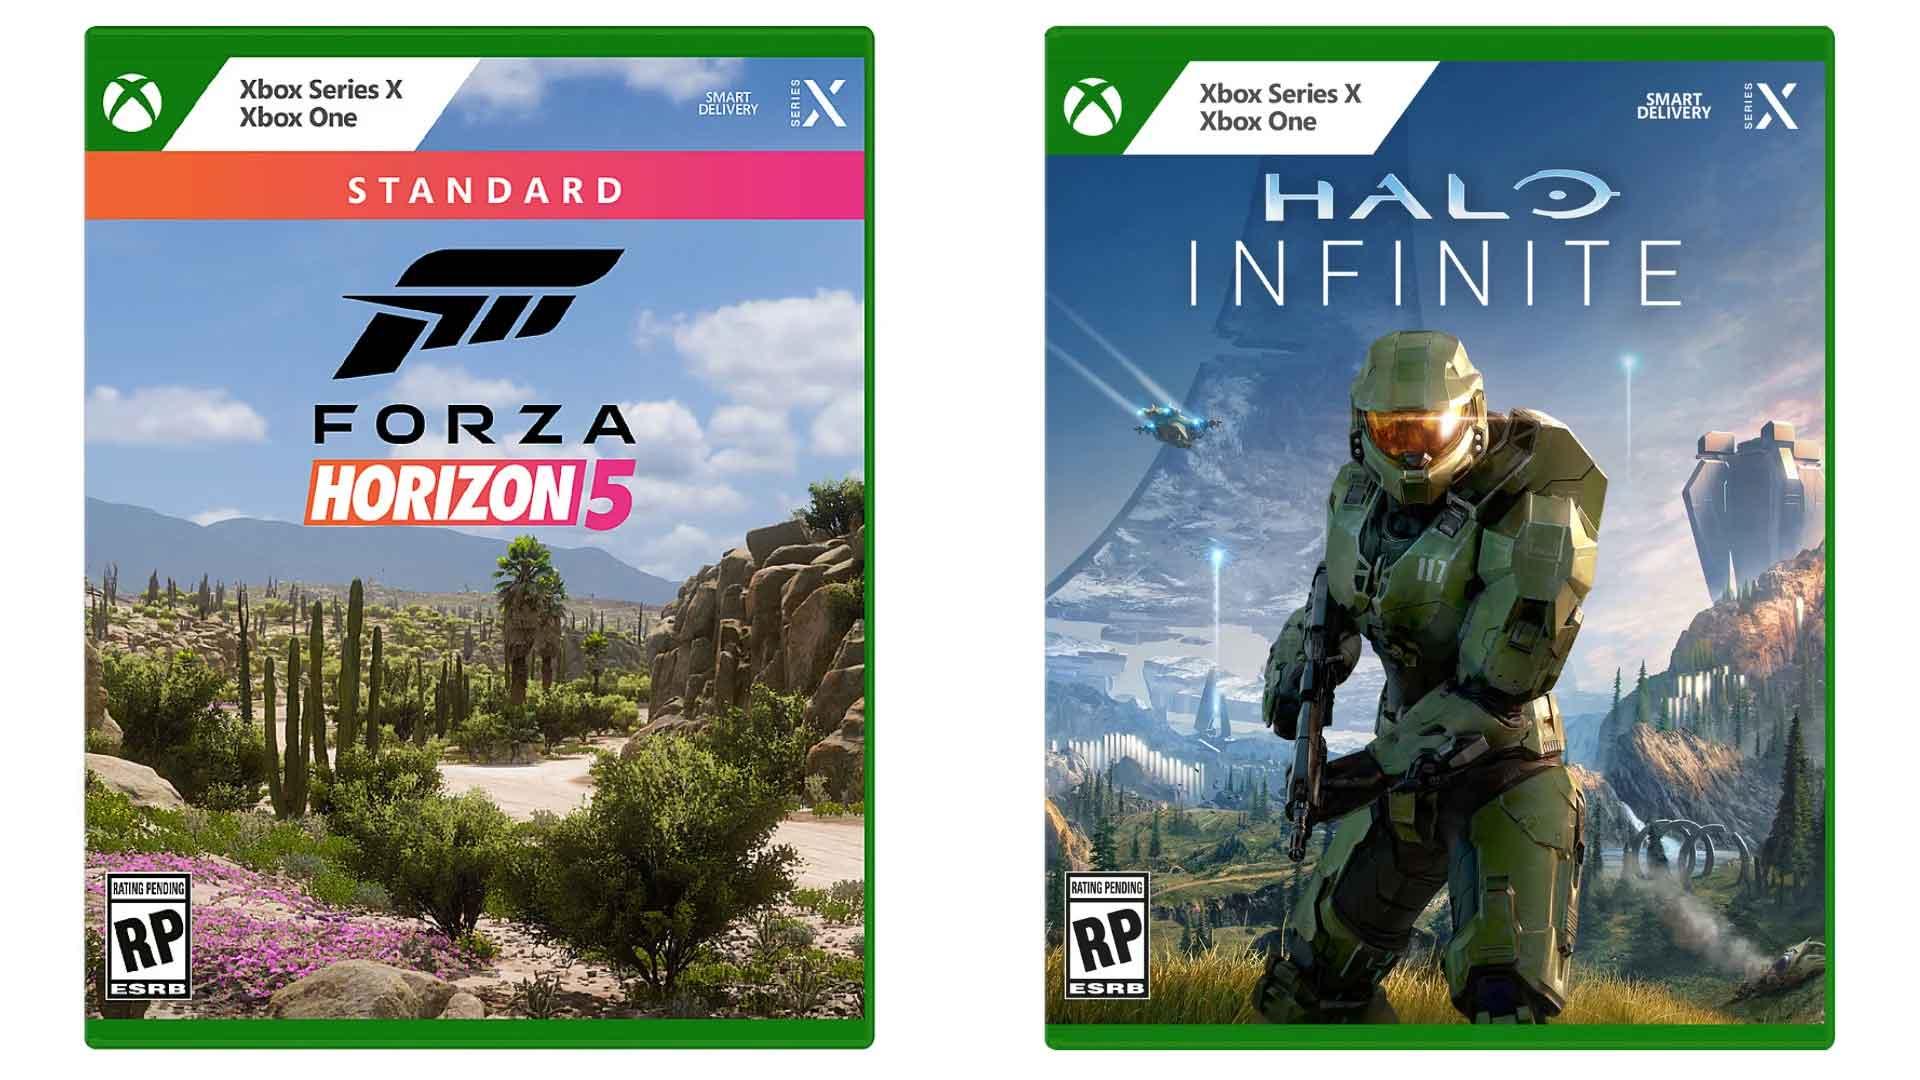 Xbox empaque, GamersRD